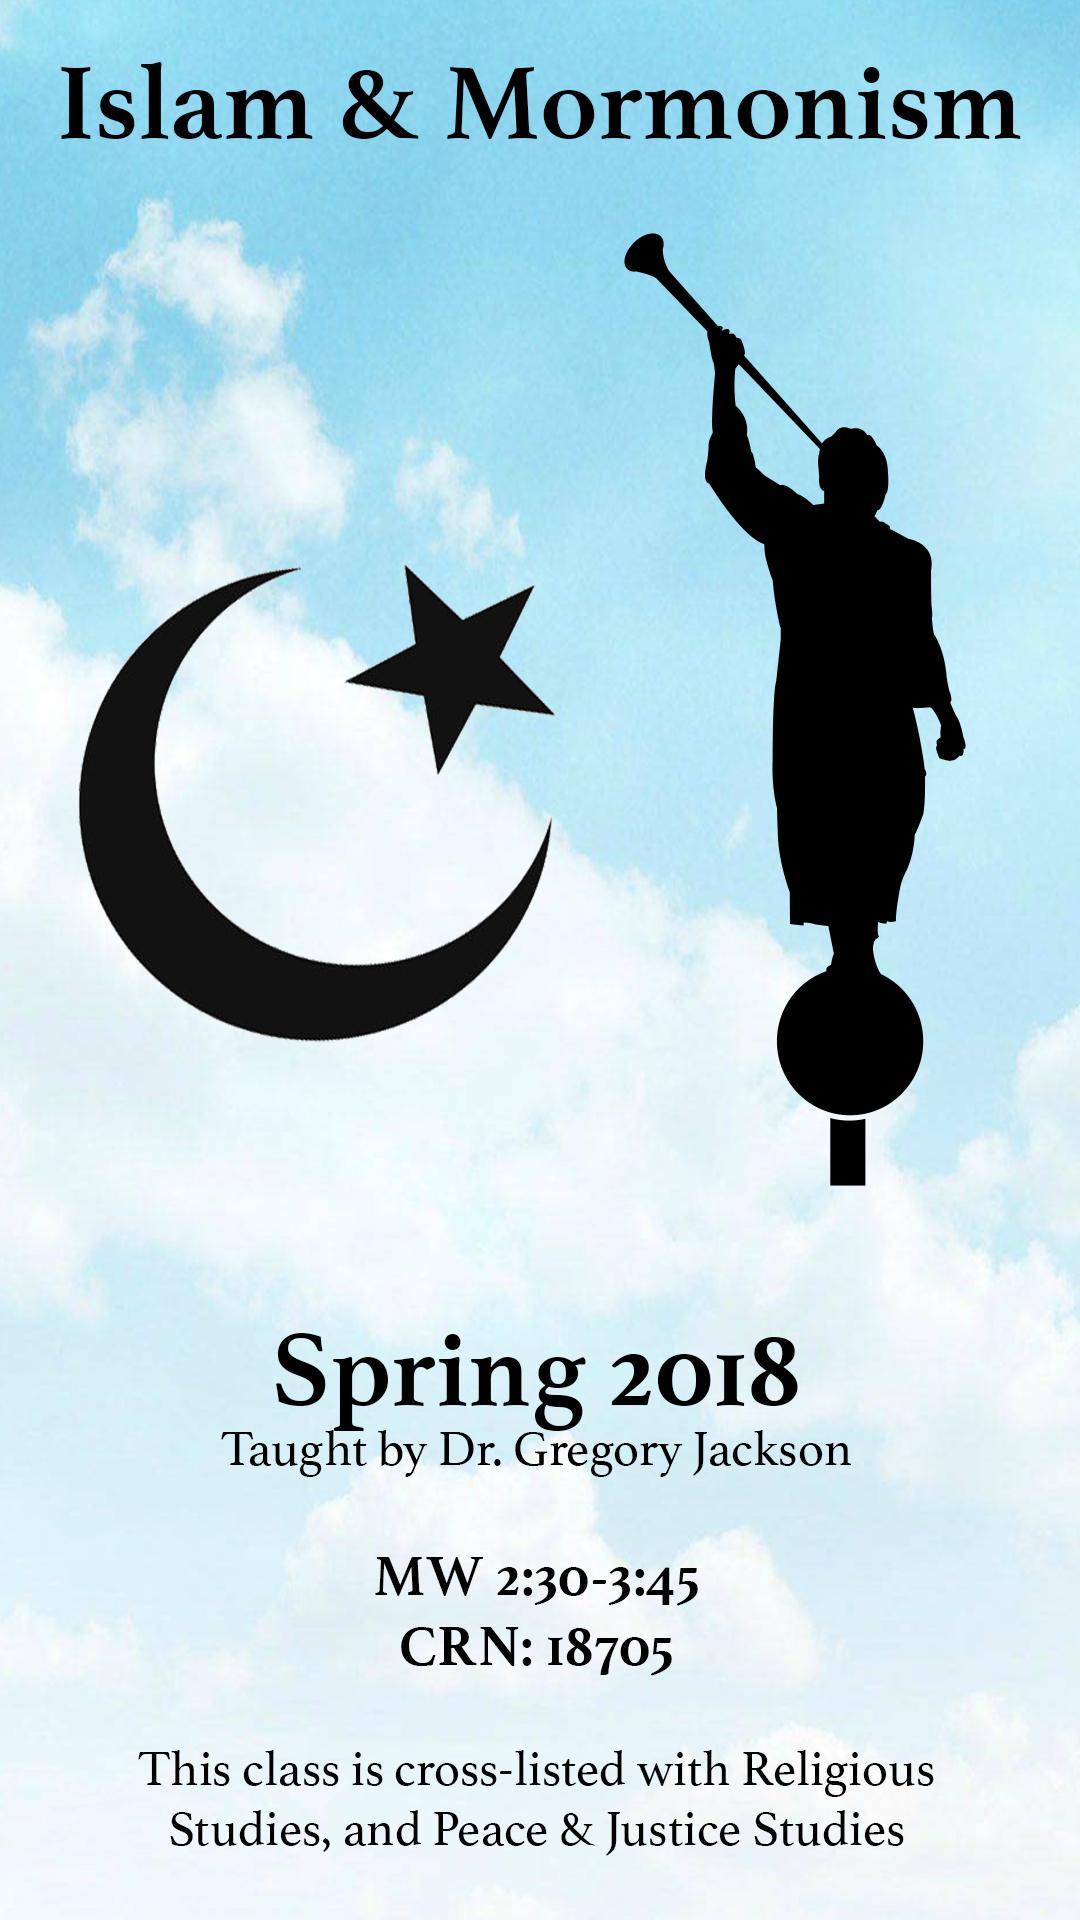 Islam & Mormonism